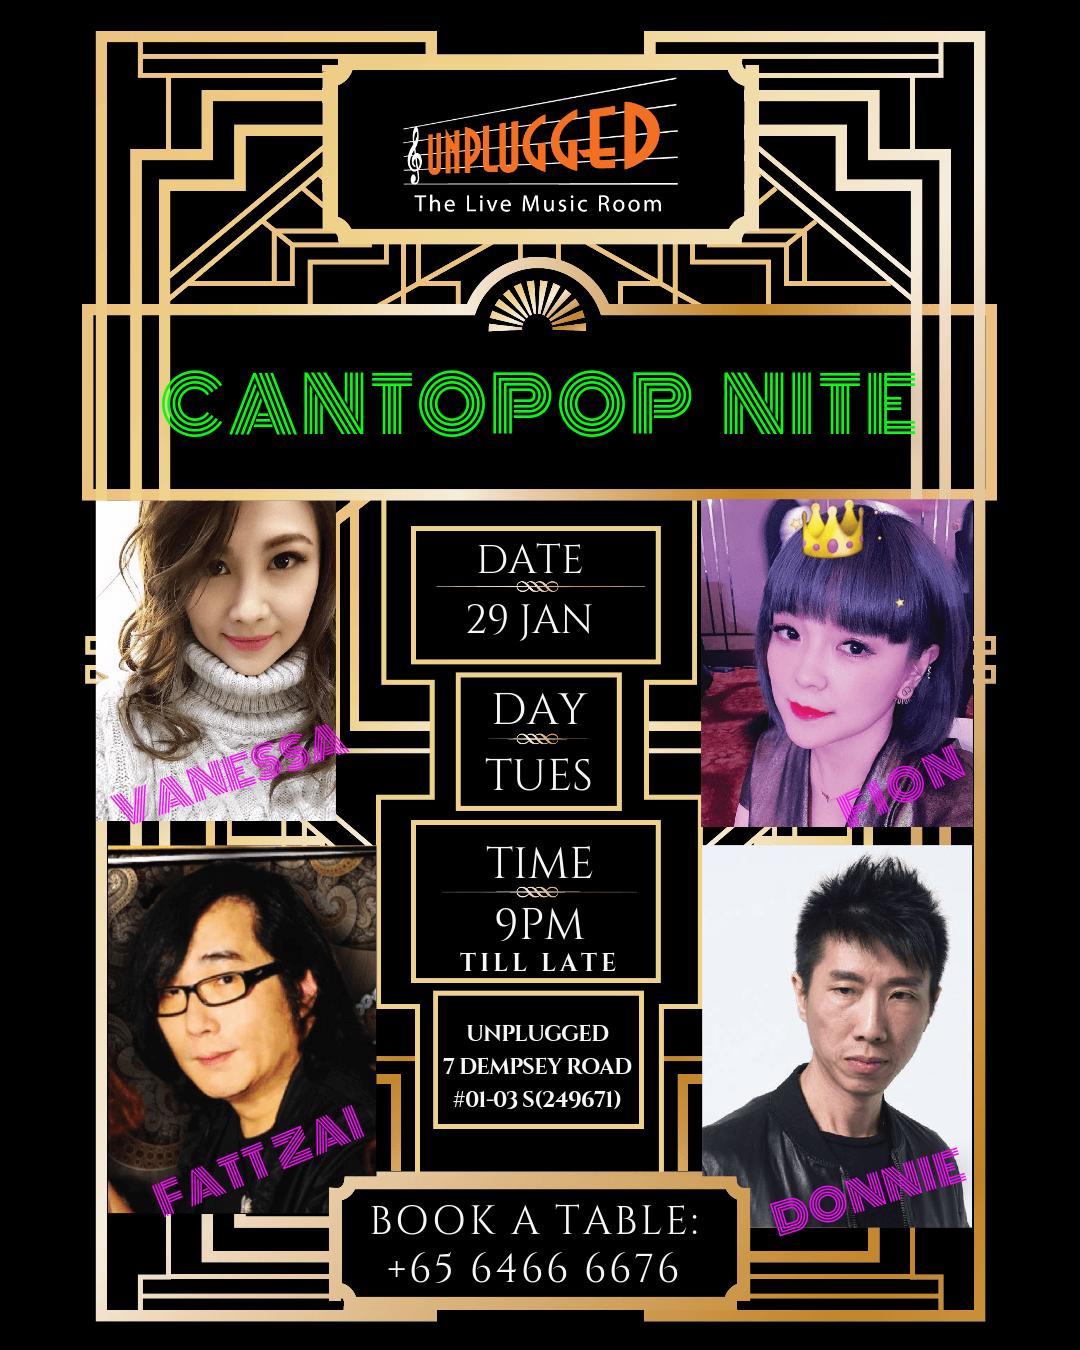 cantopop_nite_29-jan-2019